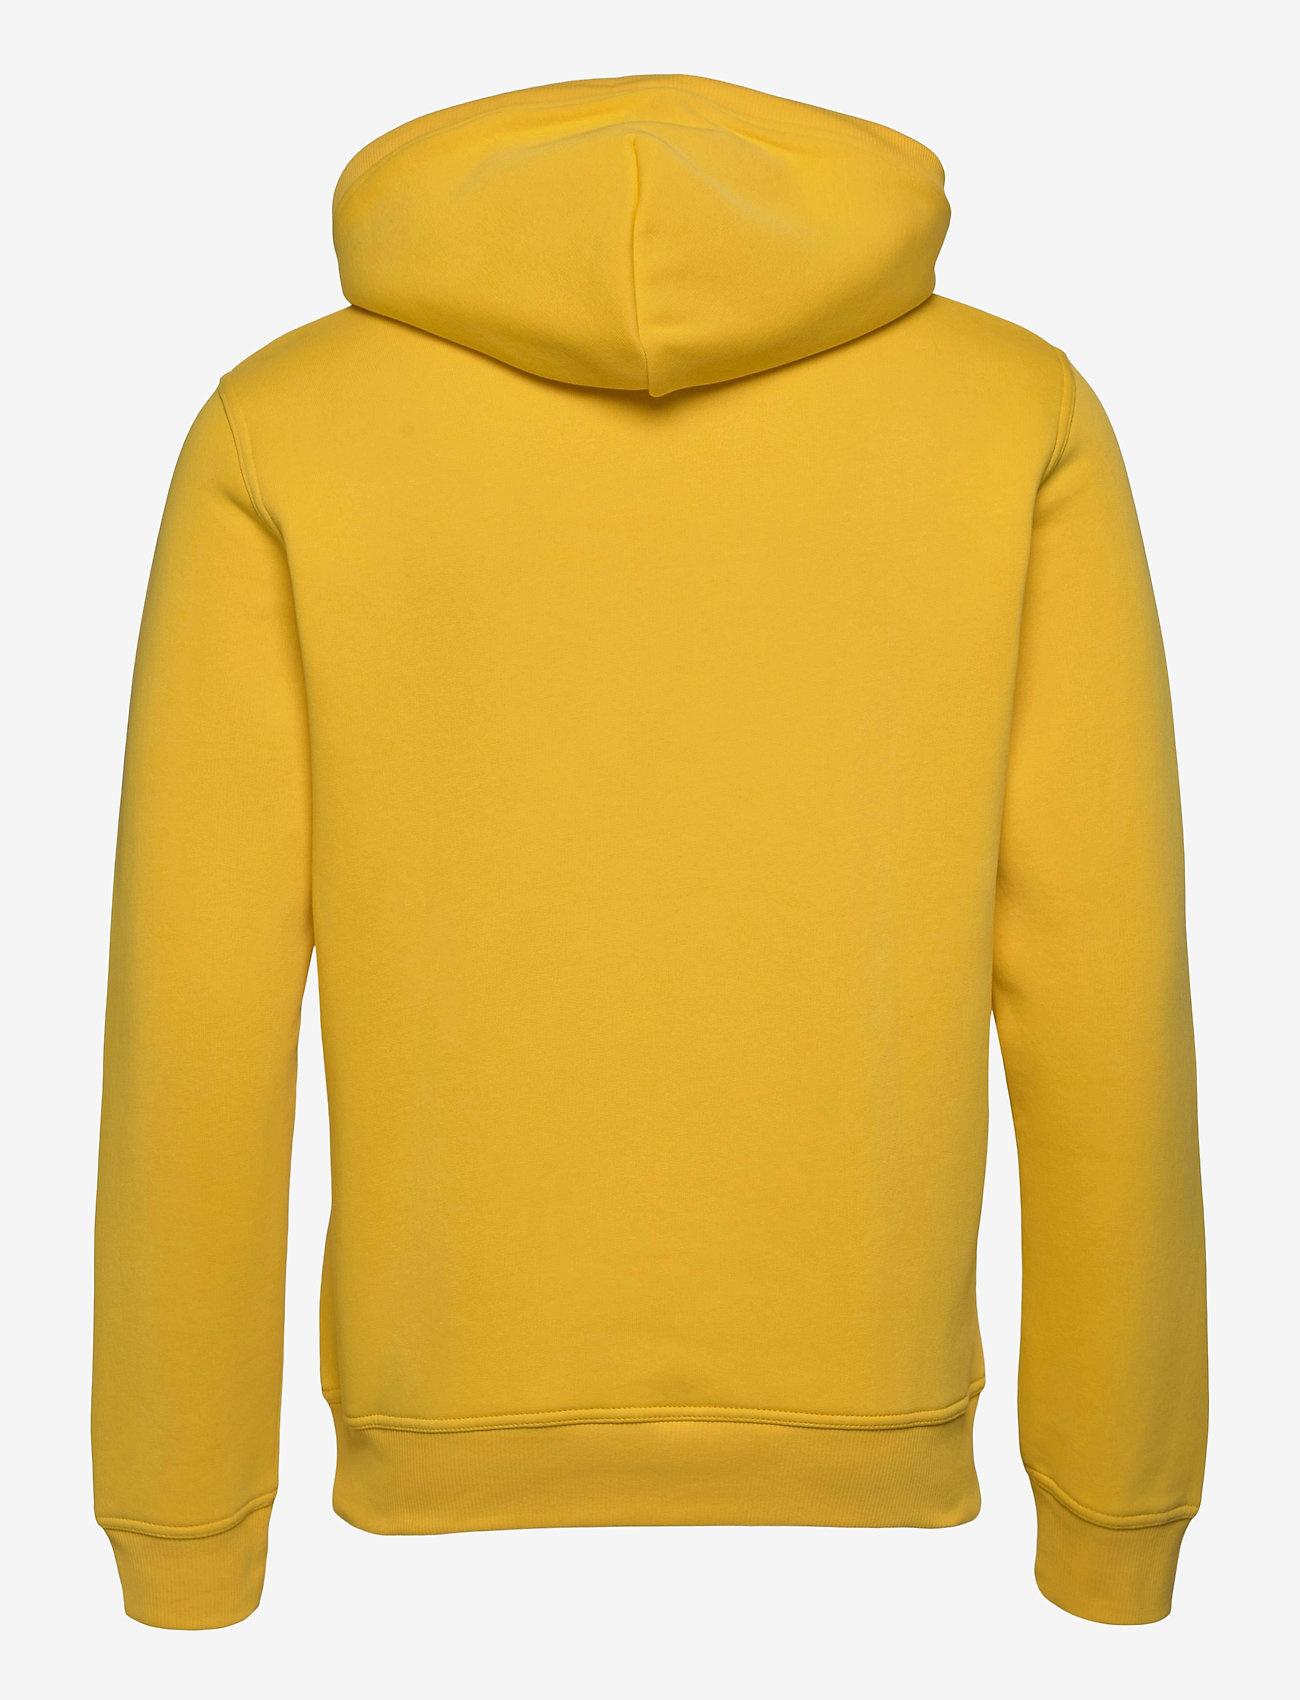 GANT Sweatvest, geel